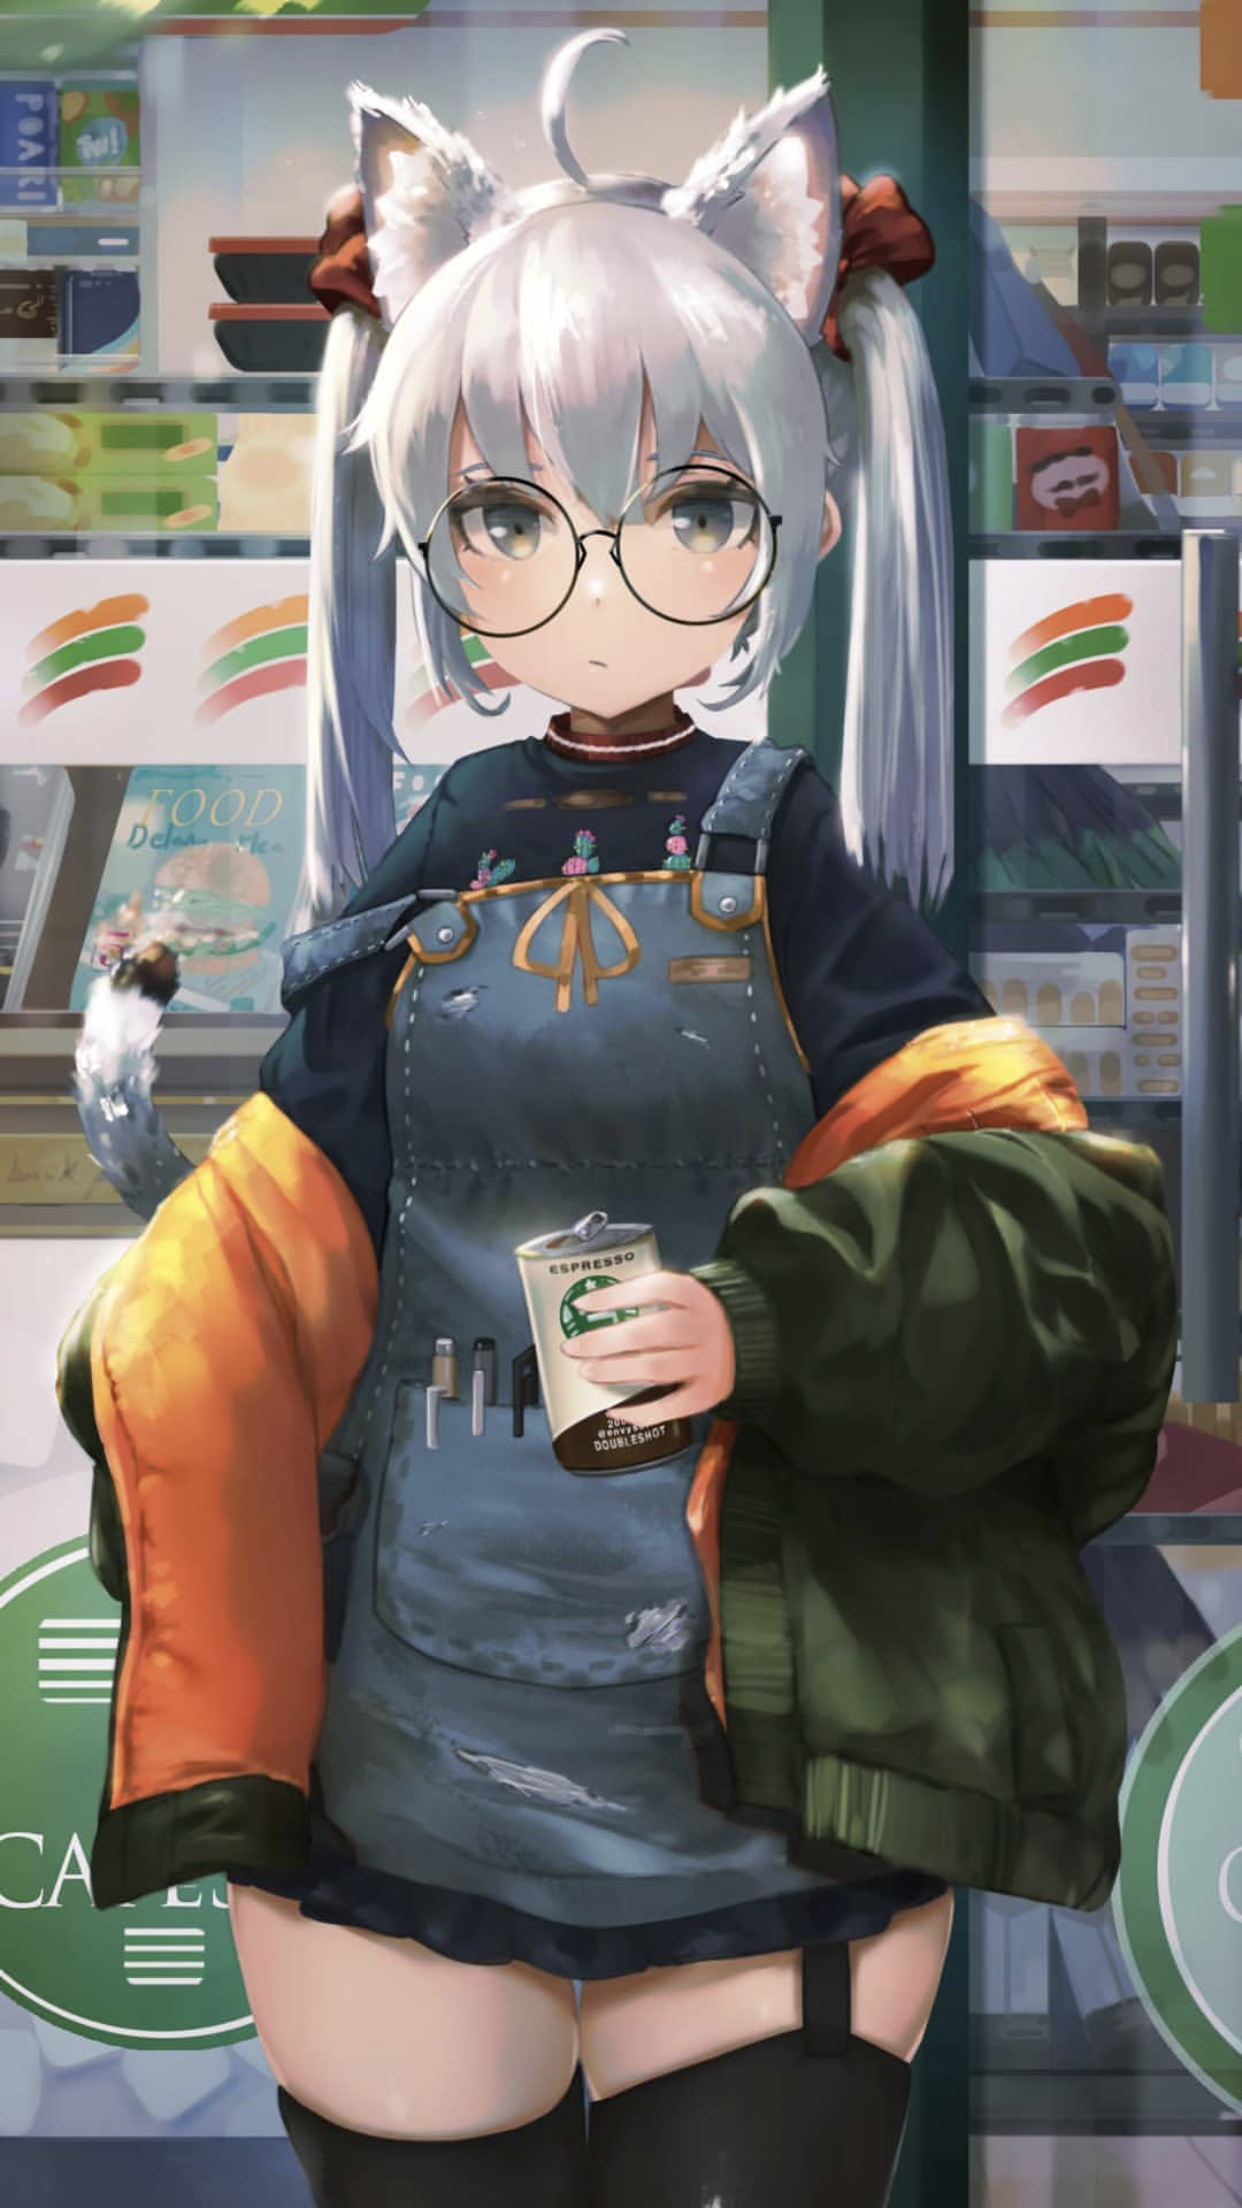 Starbucks Anime Girl Year Of Clean Water